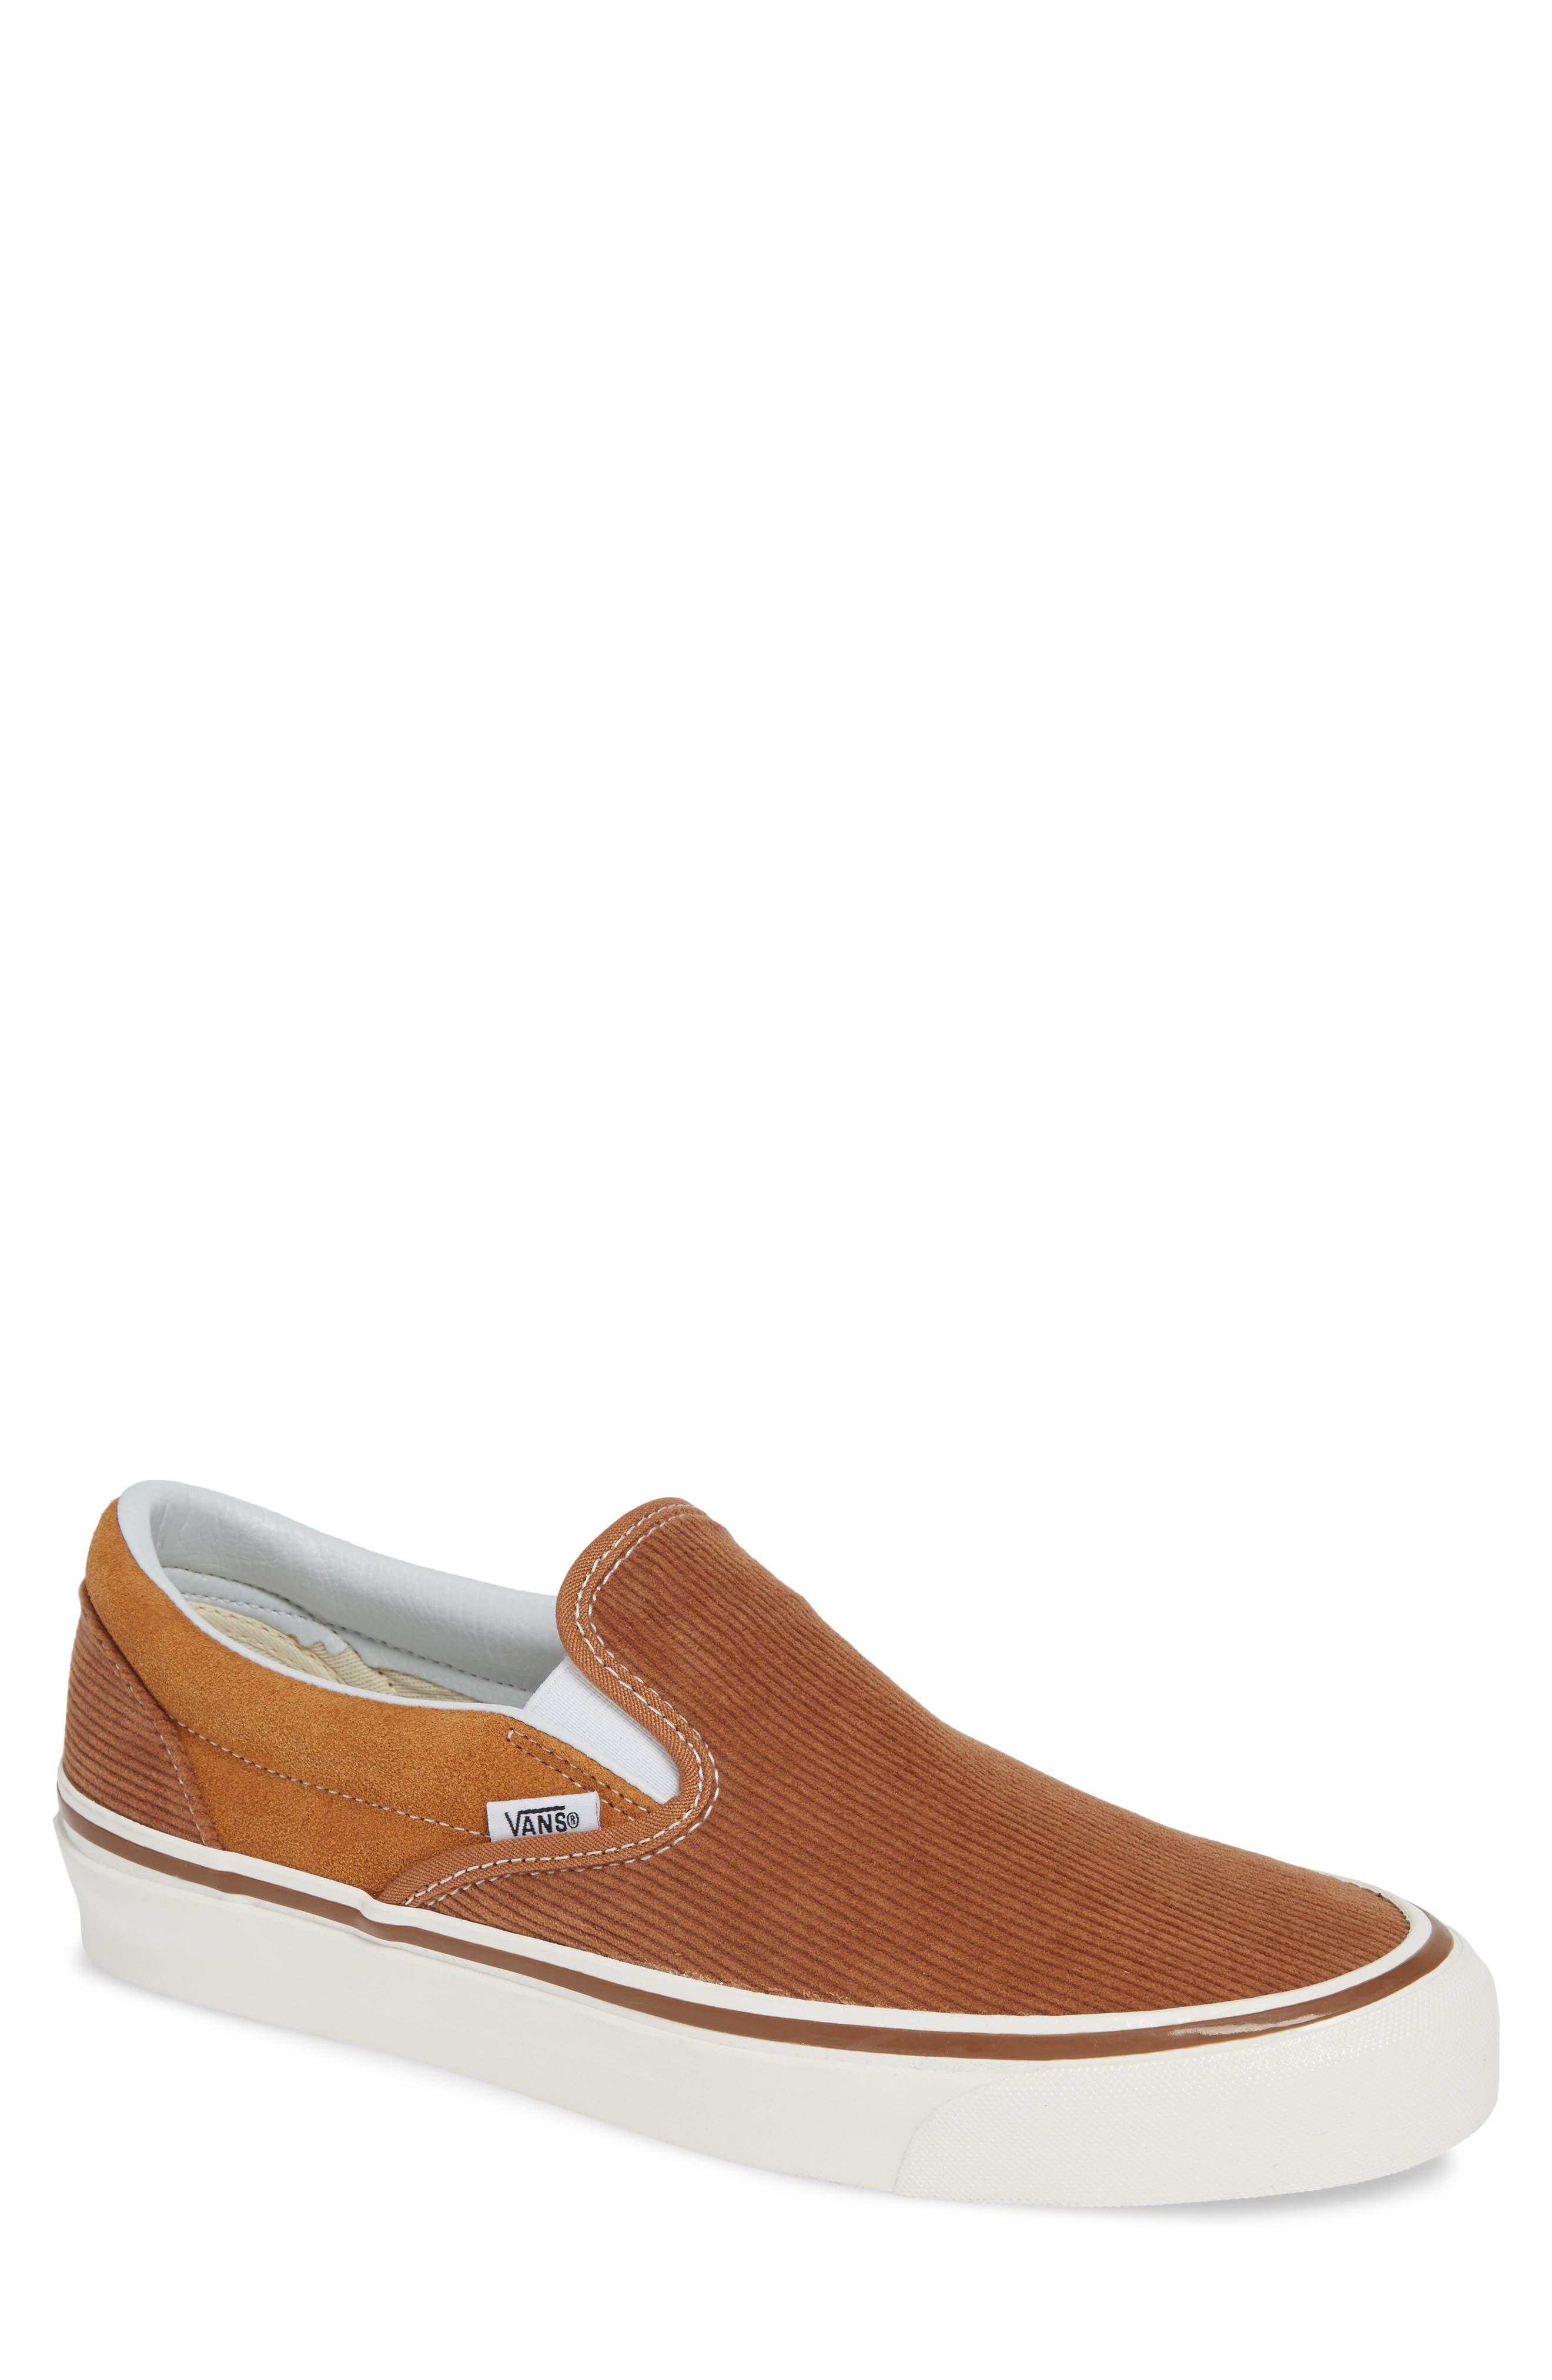 Classic 98 Dx Slip-On Sneaker in Brown/ Corduroy